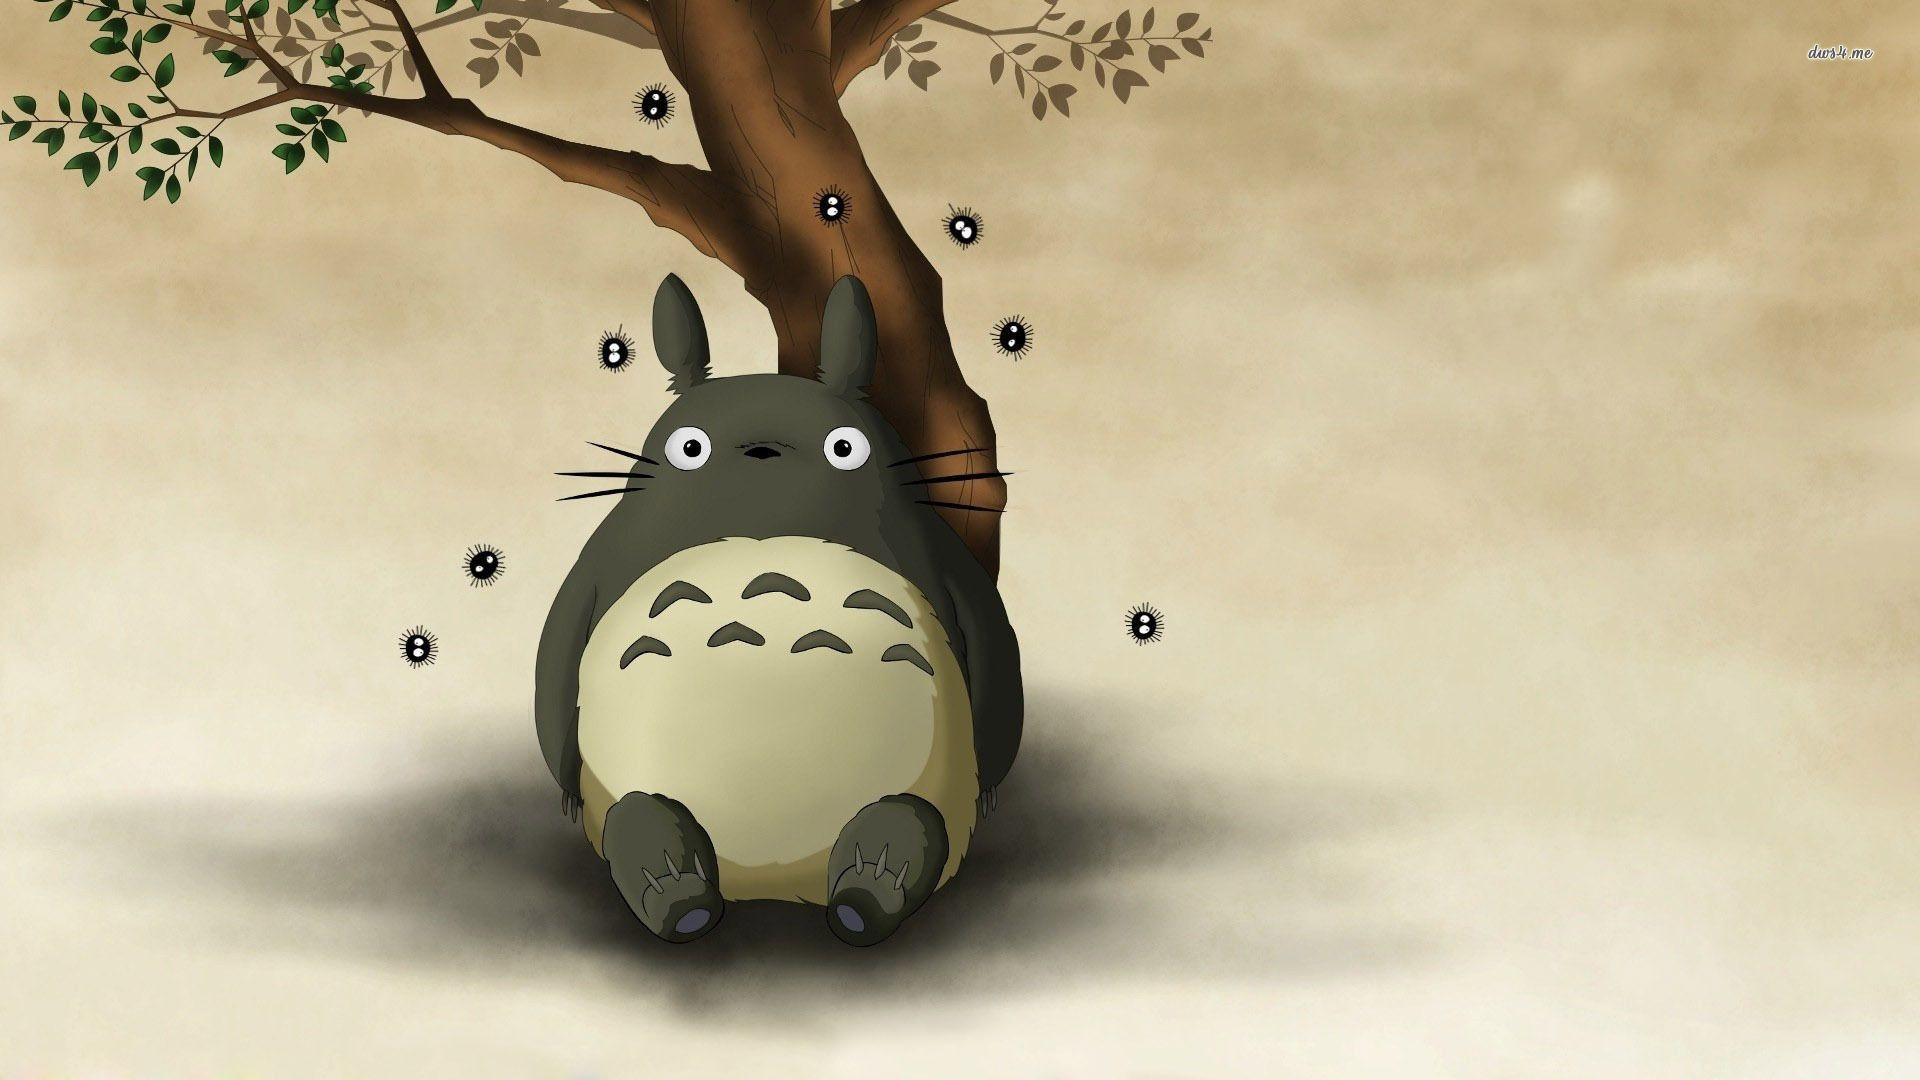 Totoro Wallpapers HD – Wallpaper Cave